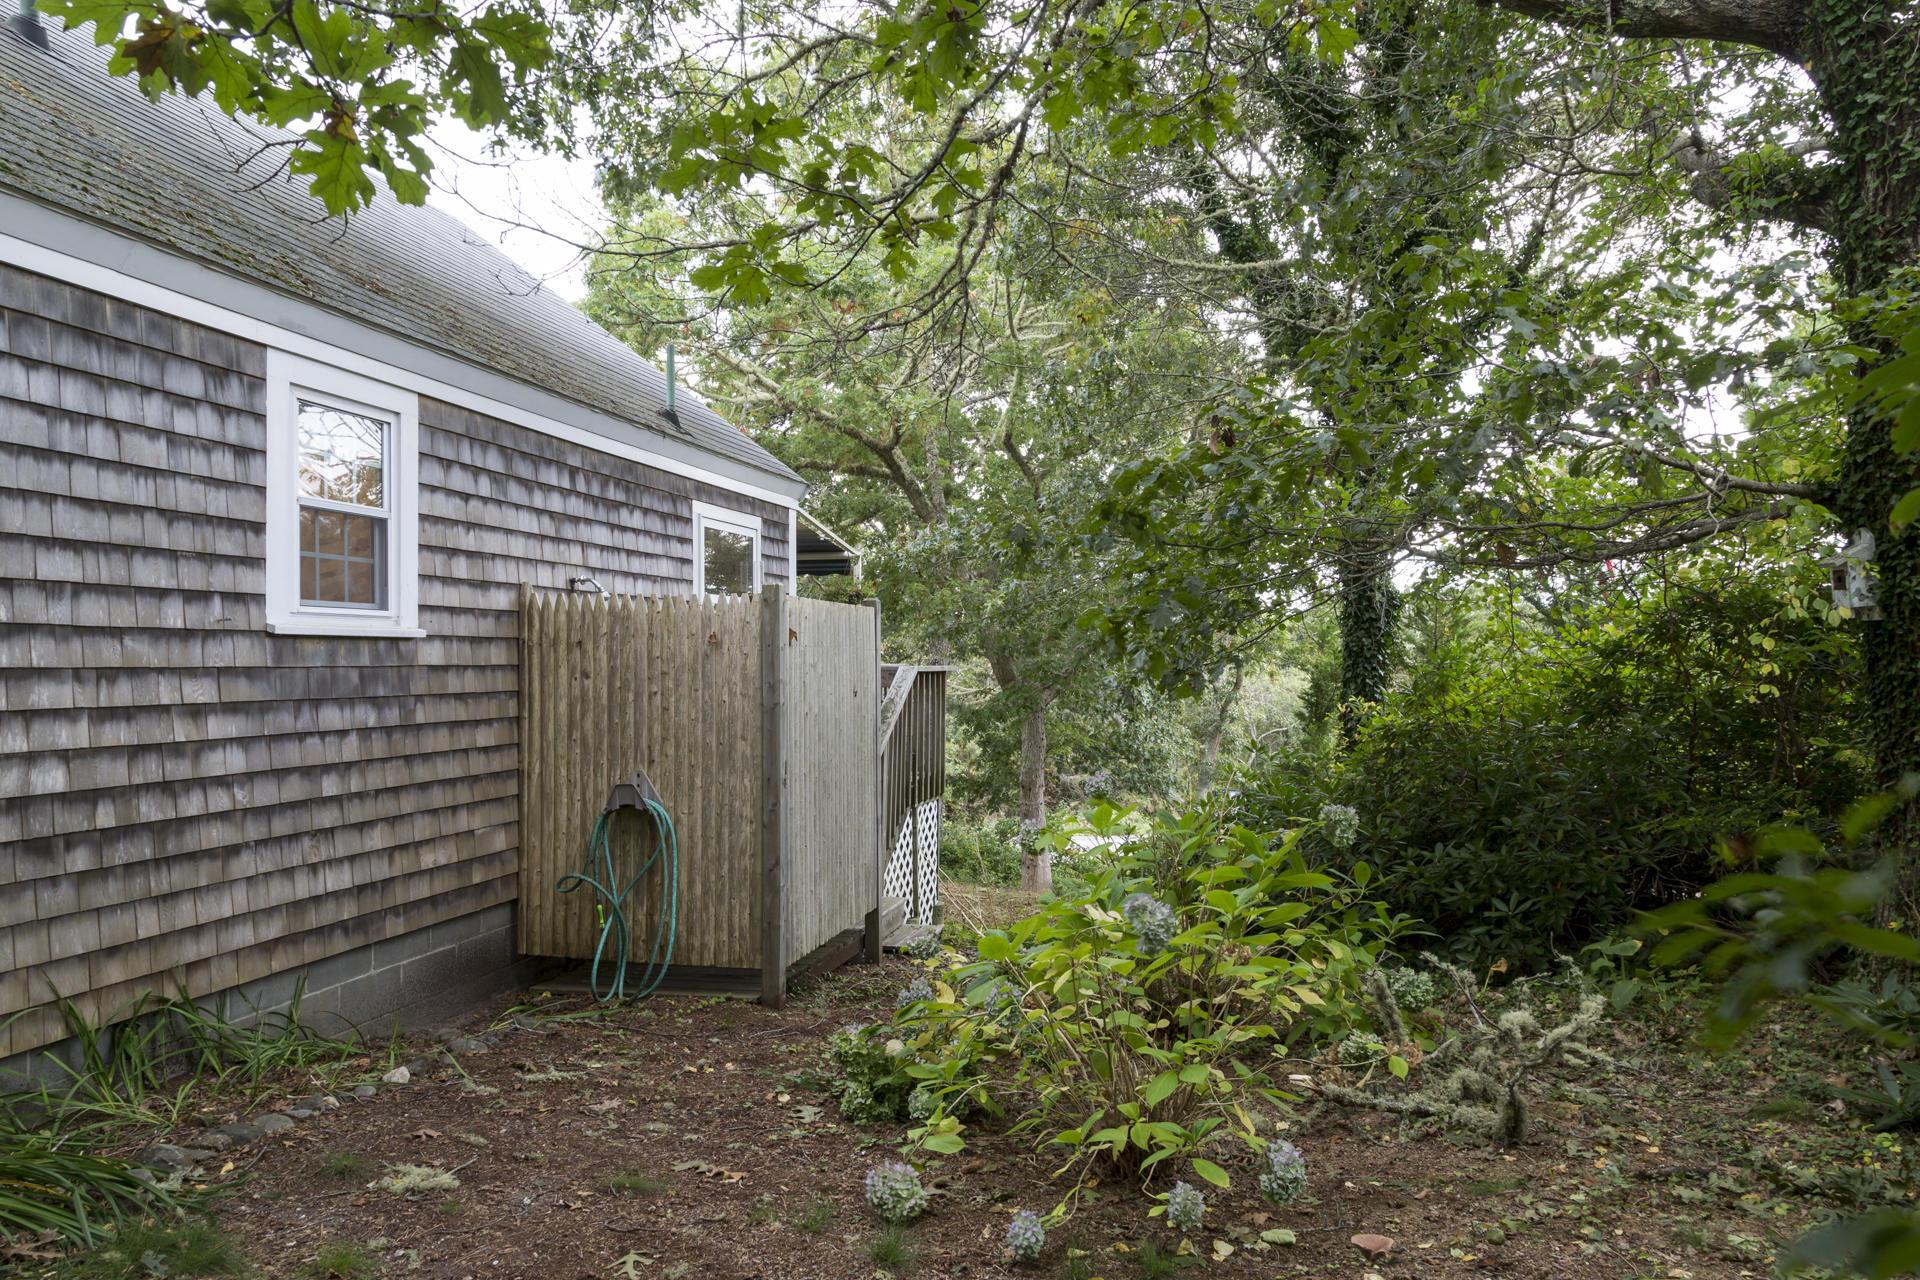 48 Overlook Drive, Chatham MA, 02633 - slide 14